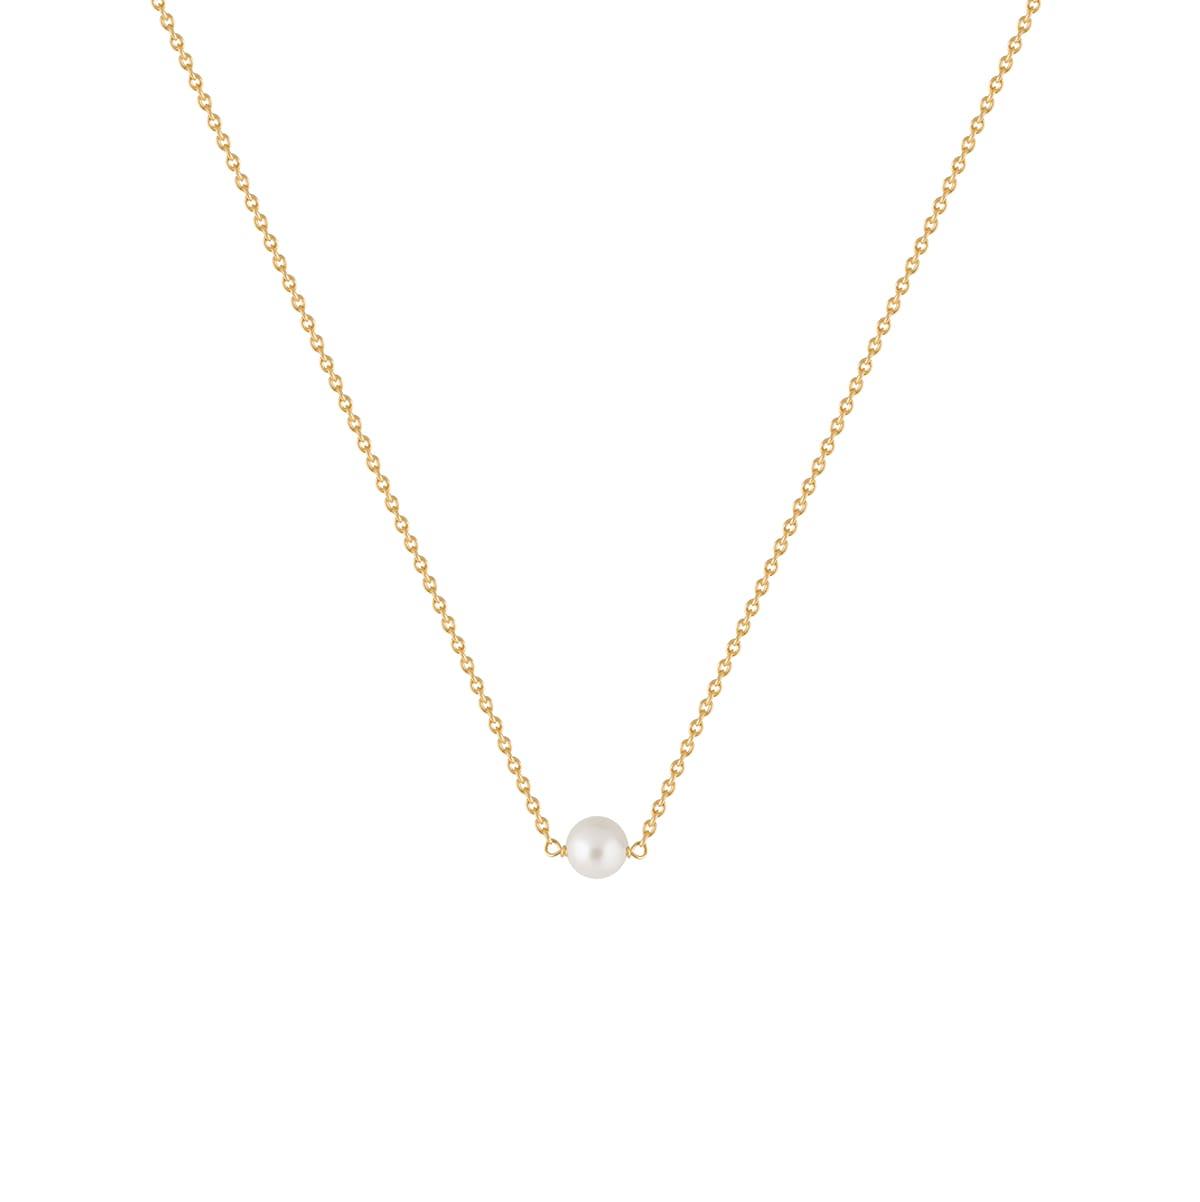 Sophie_by_Sophie_Pearl_necklace_B0721GPS0-OS_Jarl_Sandin